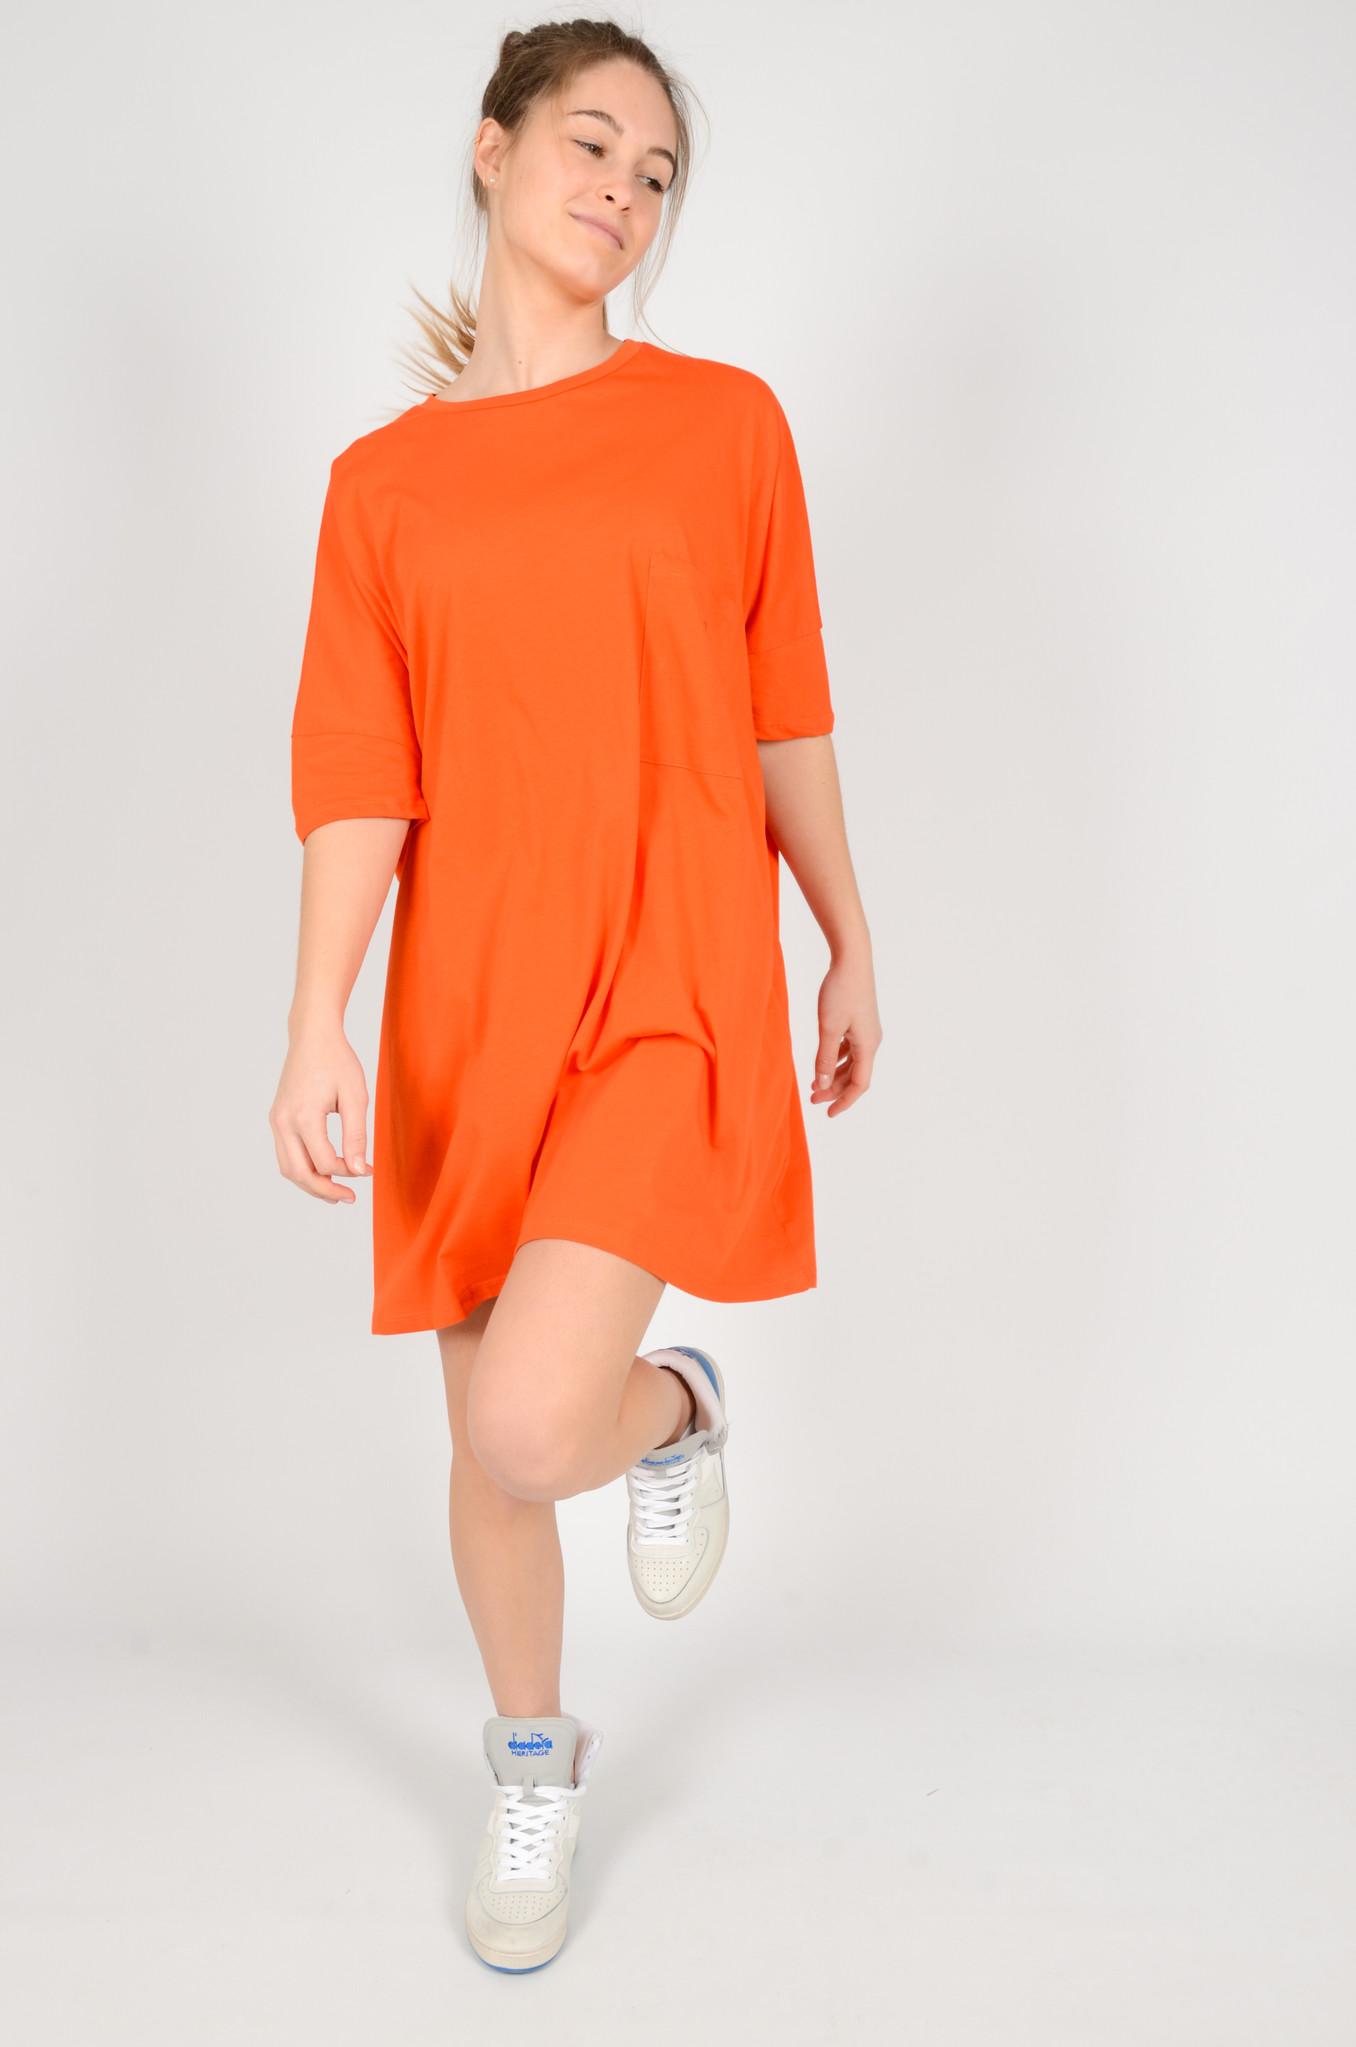 T-DRESS ORANGE-5